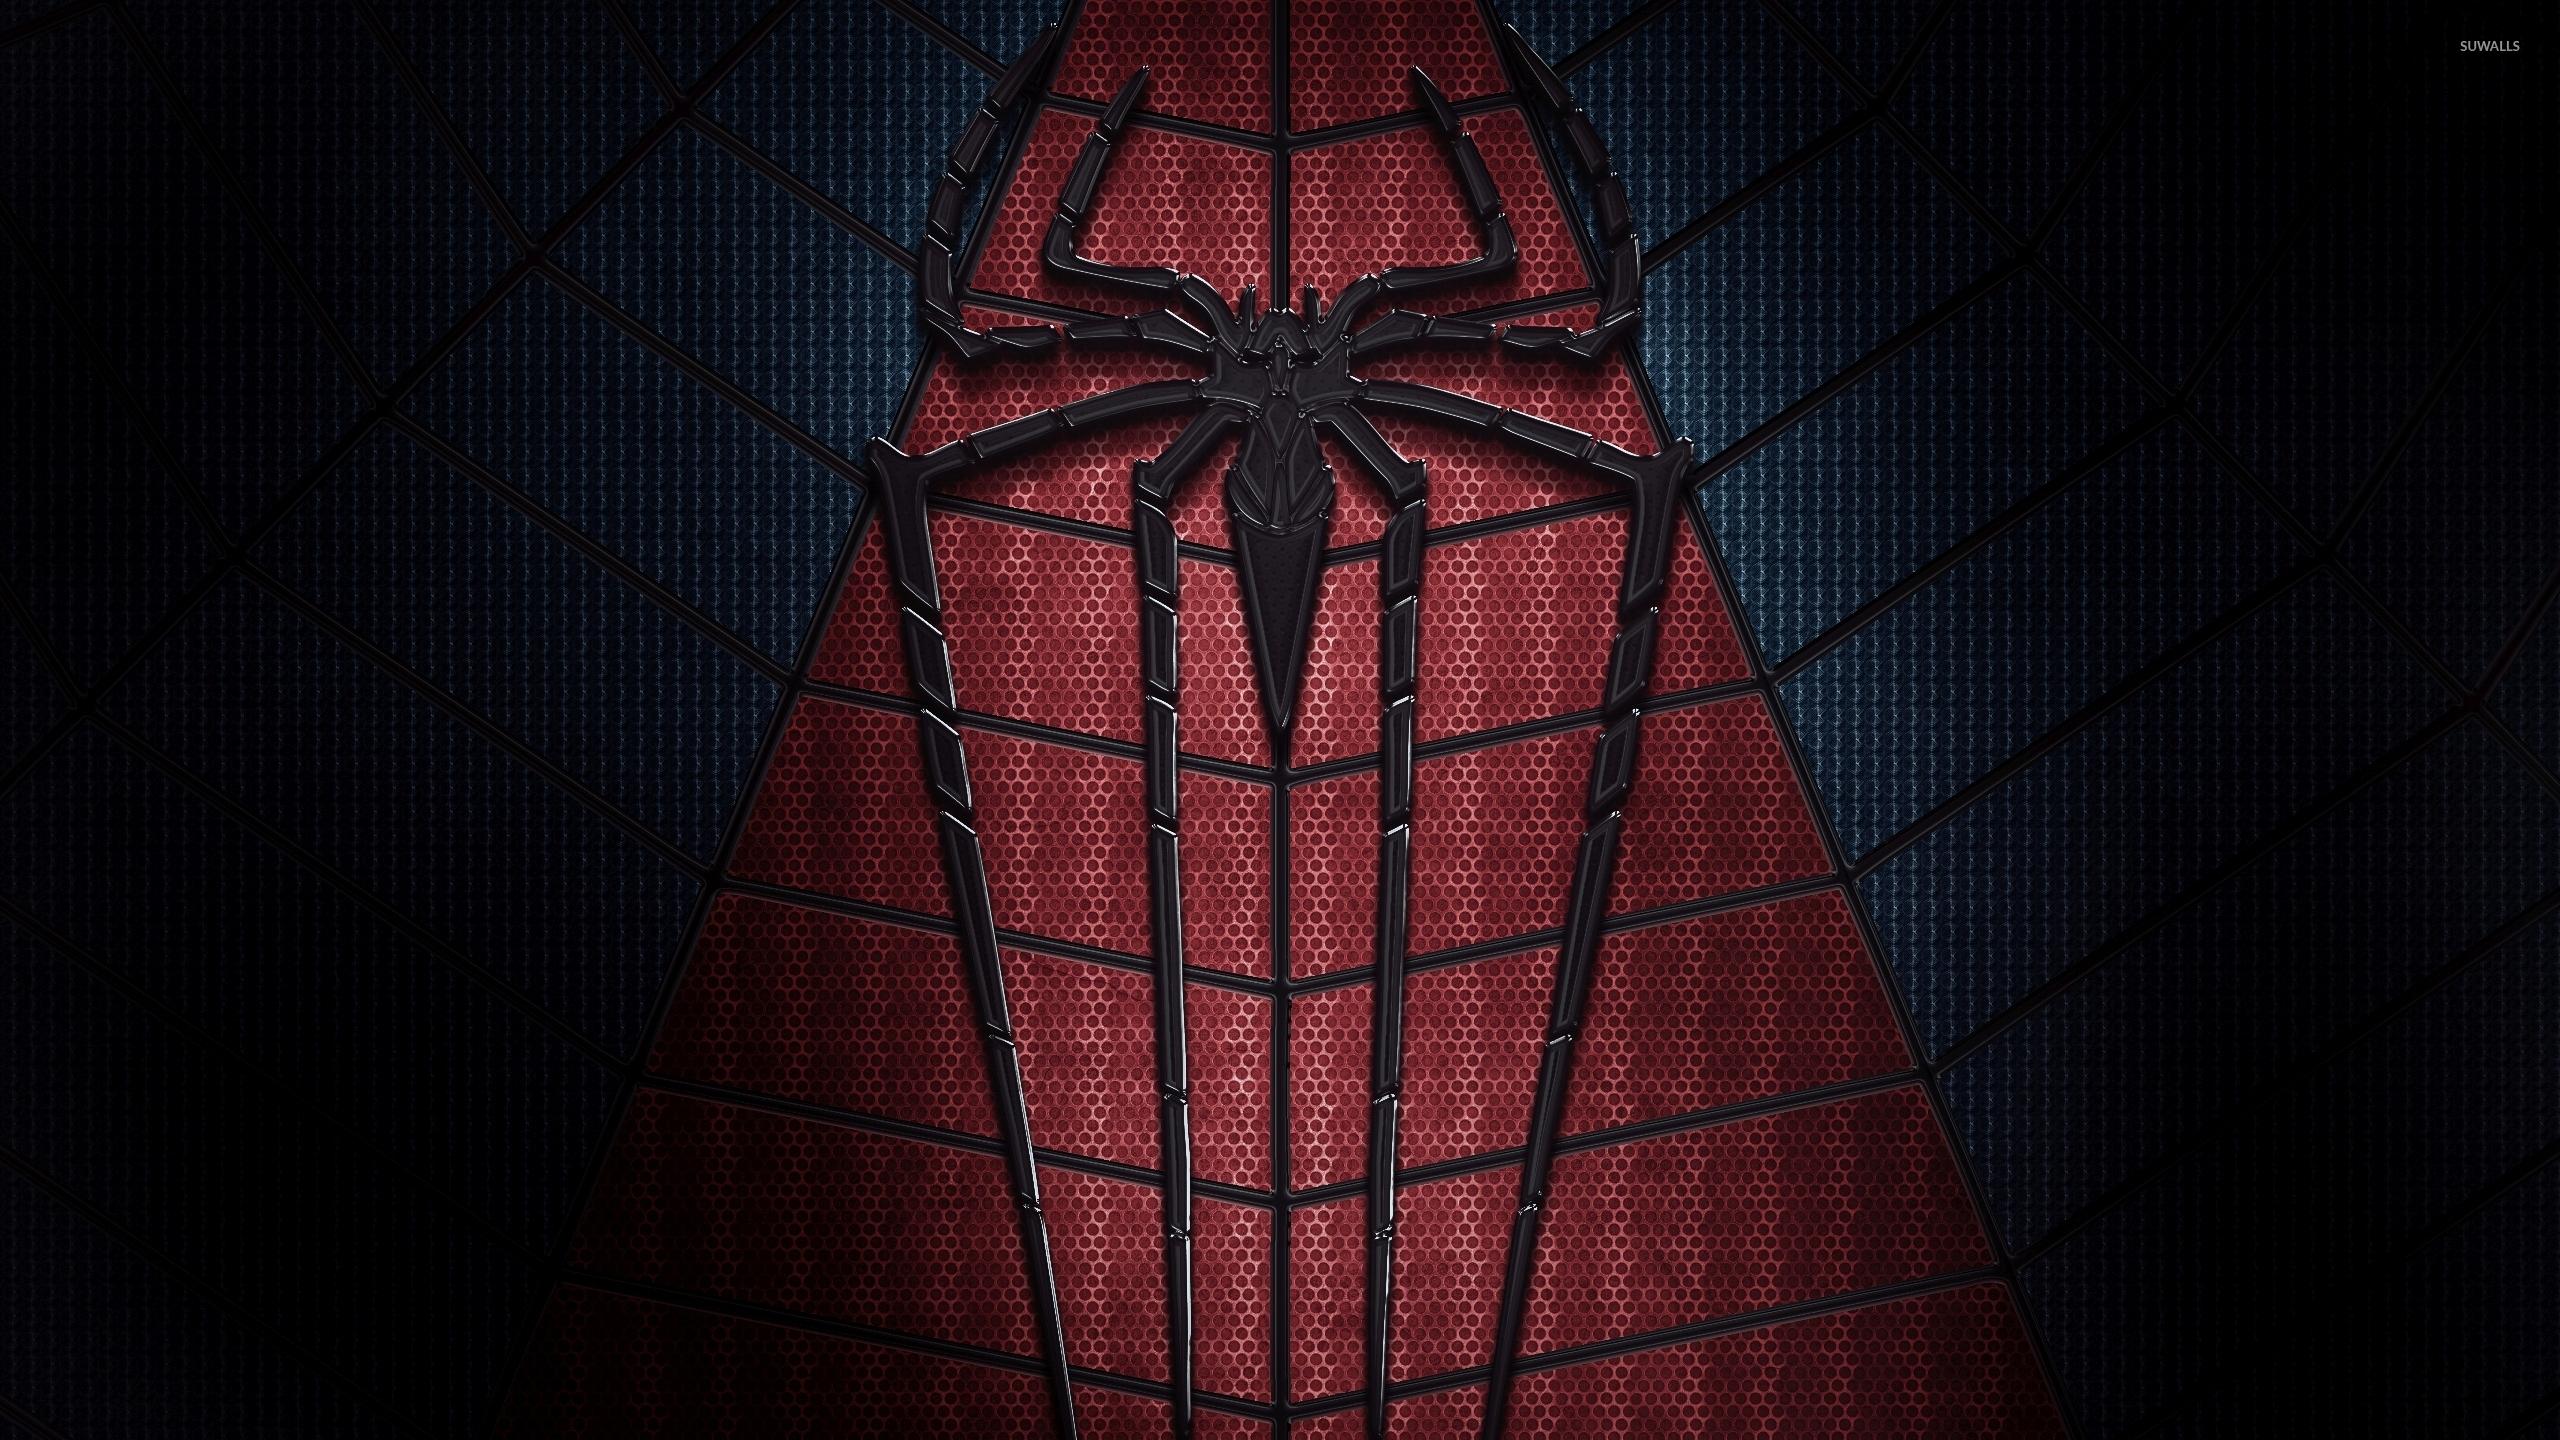 Amazing spider man logo wallpaper - photo#19